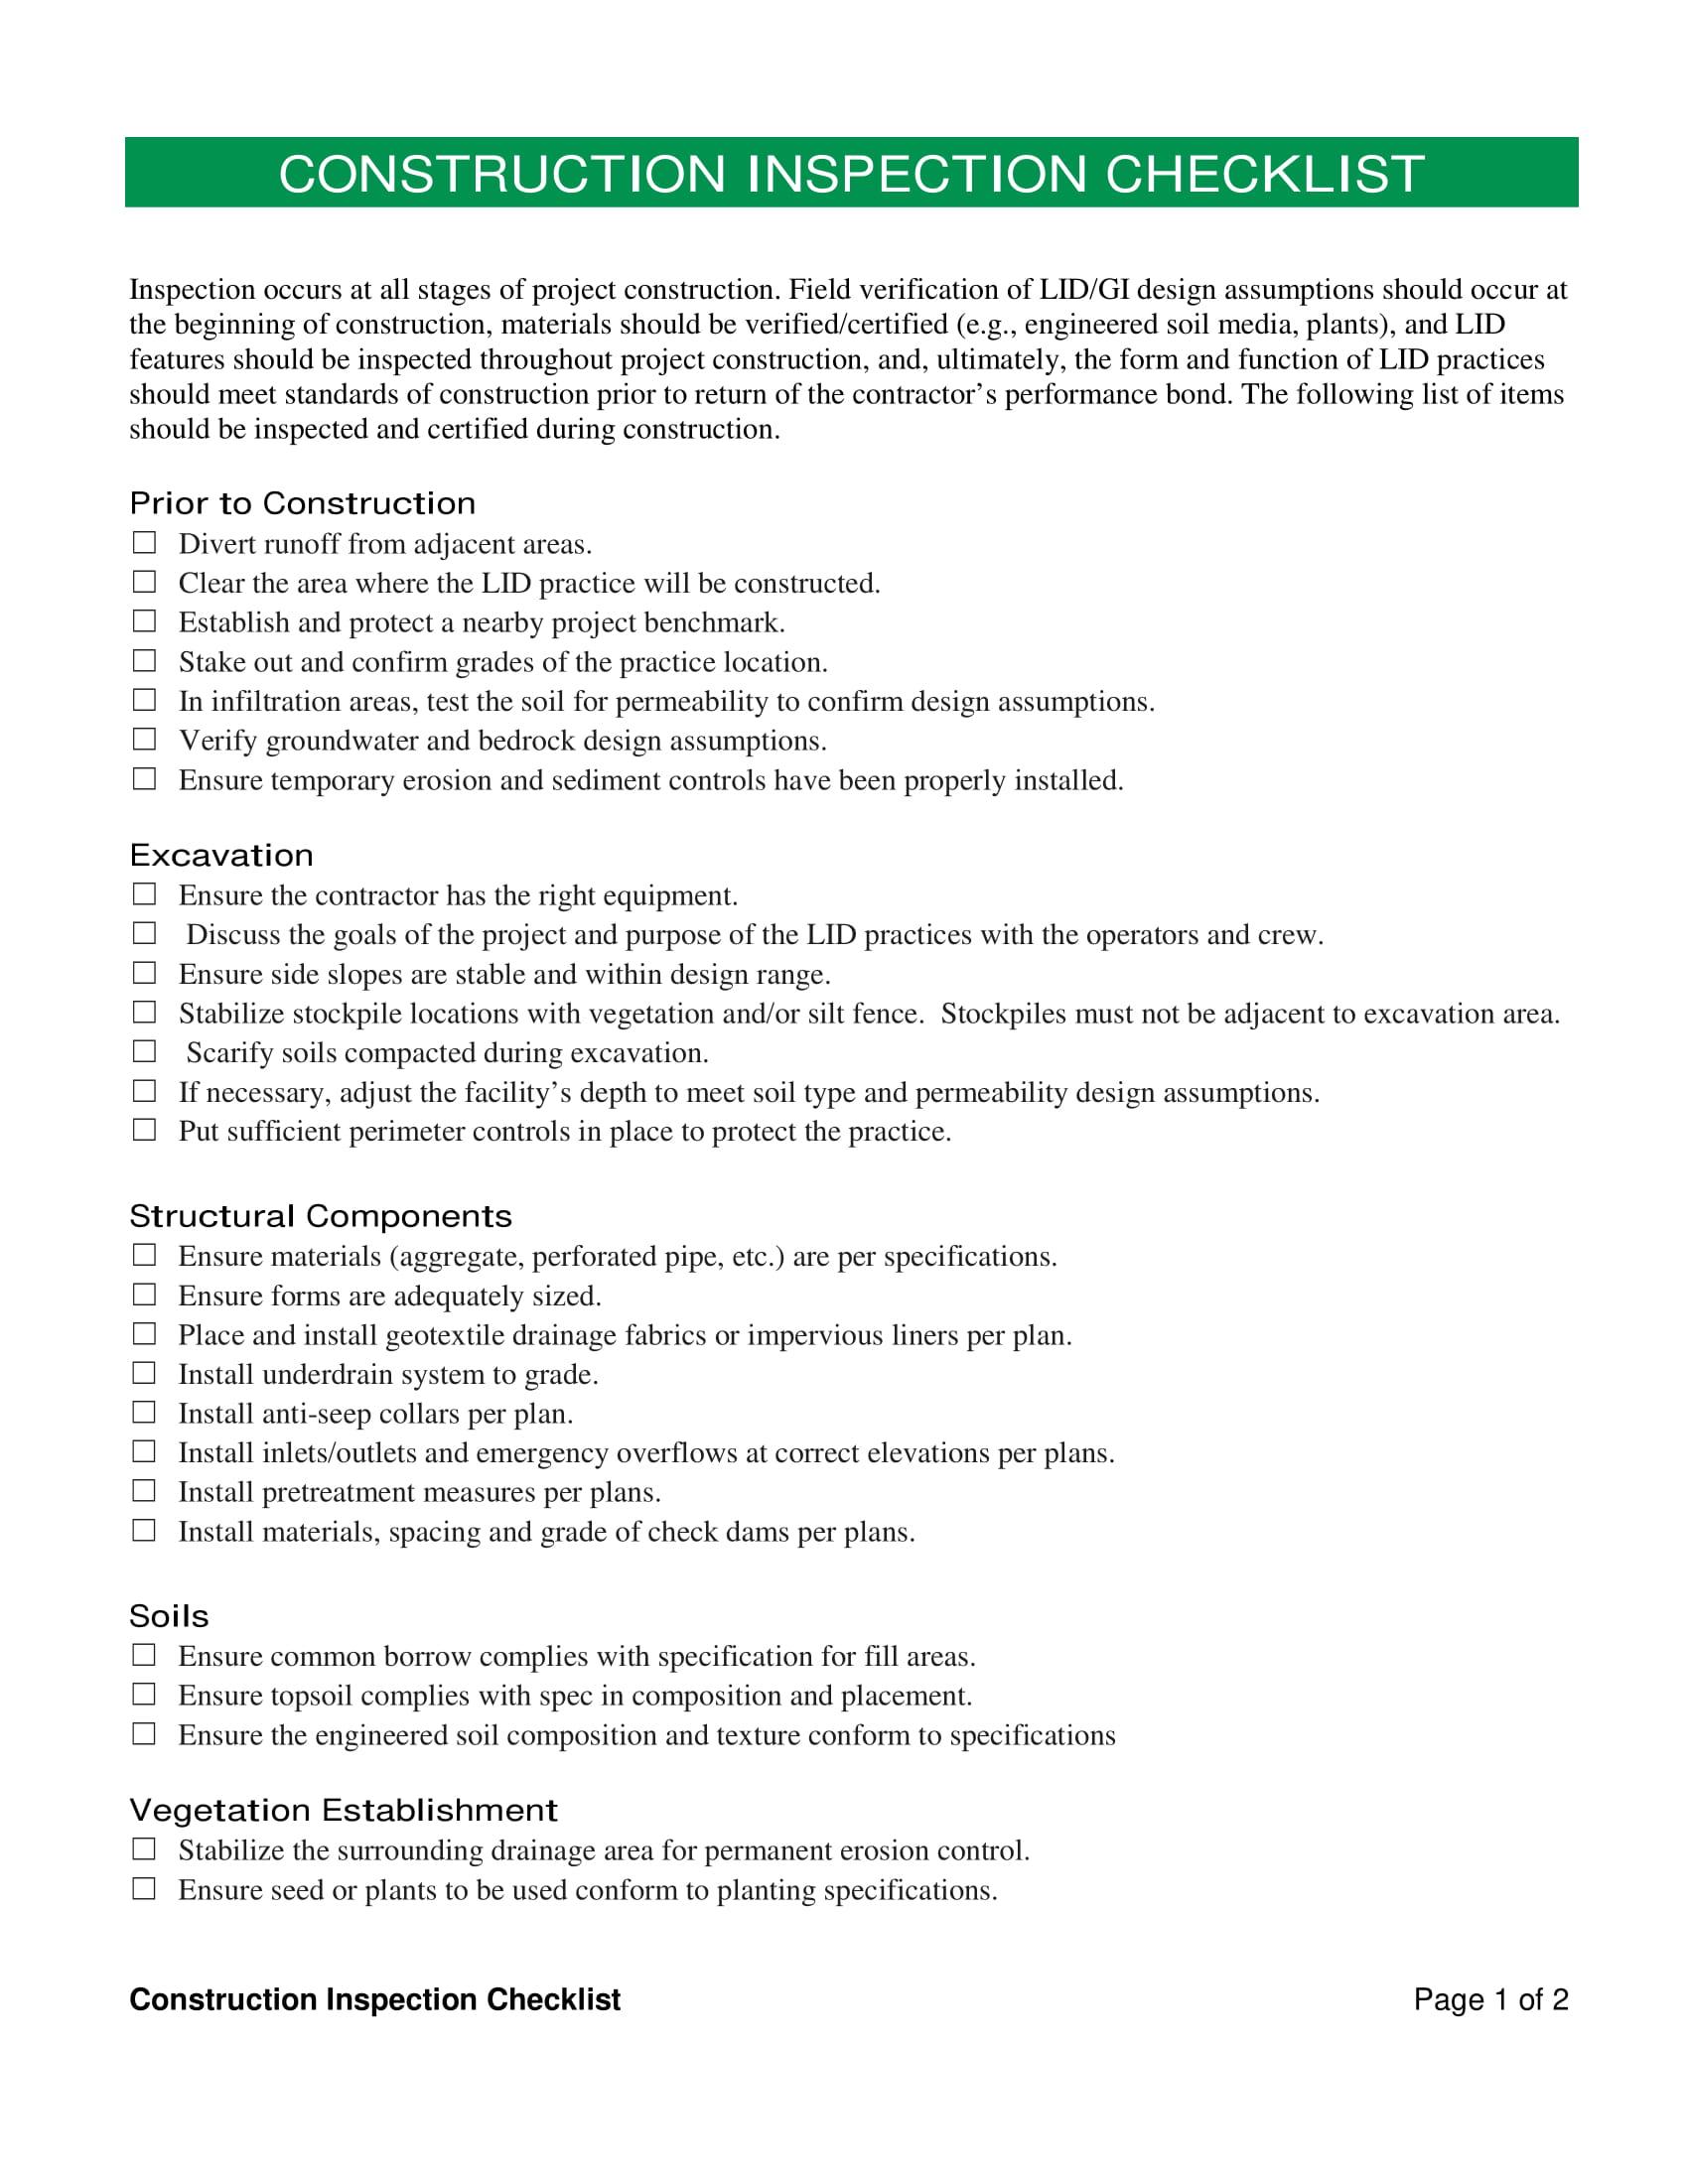 construction inspection checklist form 1